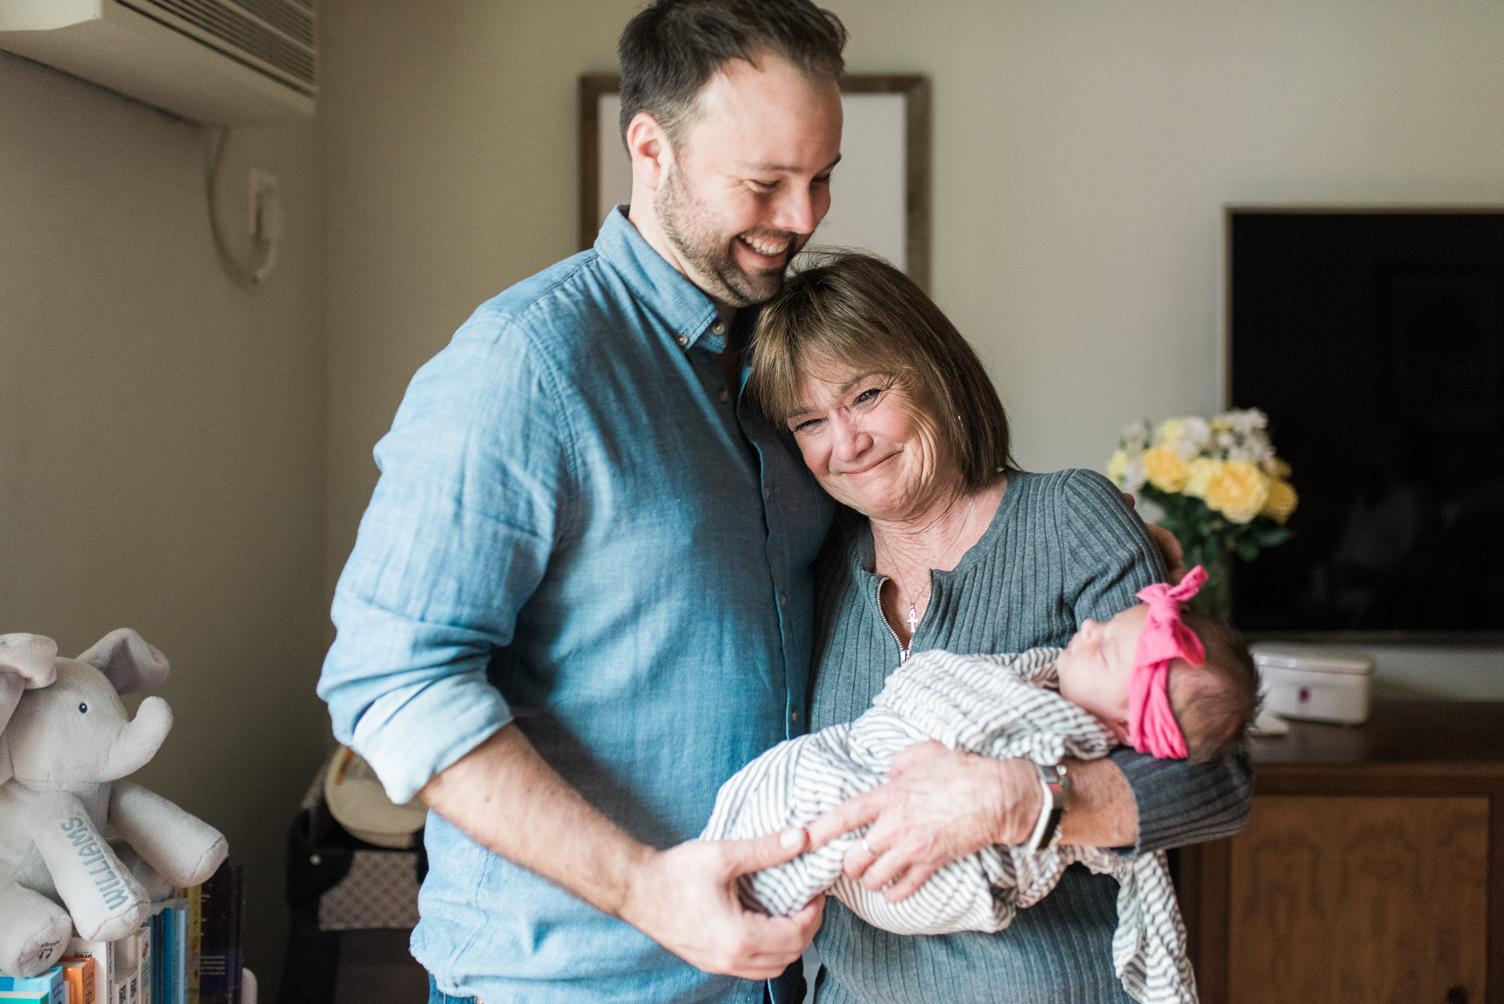 Newborn-photographer-BKLP-Baltimore-Maryland-Brooklyn-New York-lifestyle-photography-Breanna Kuhlmann-8.jpg